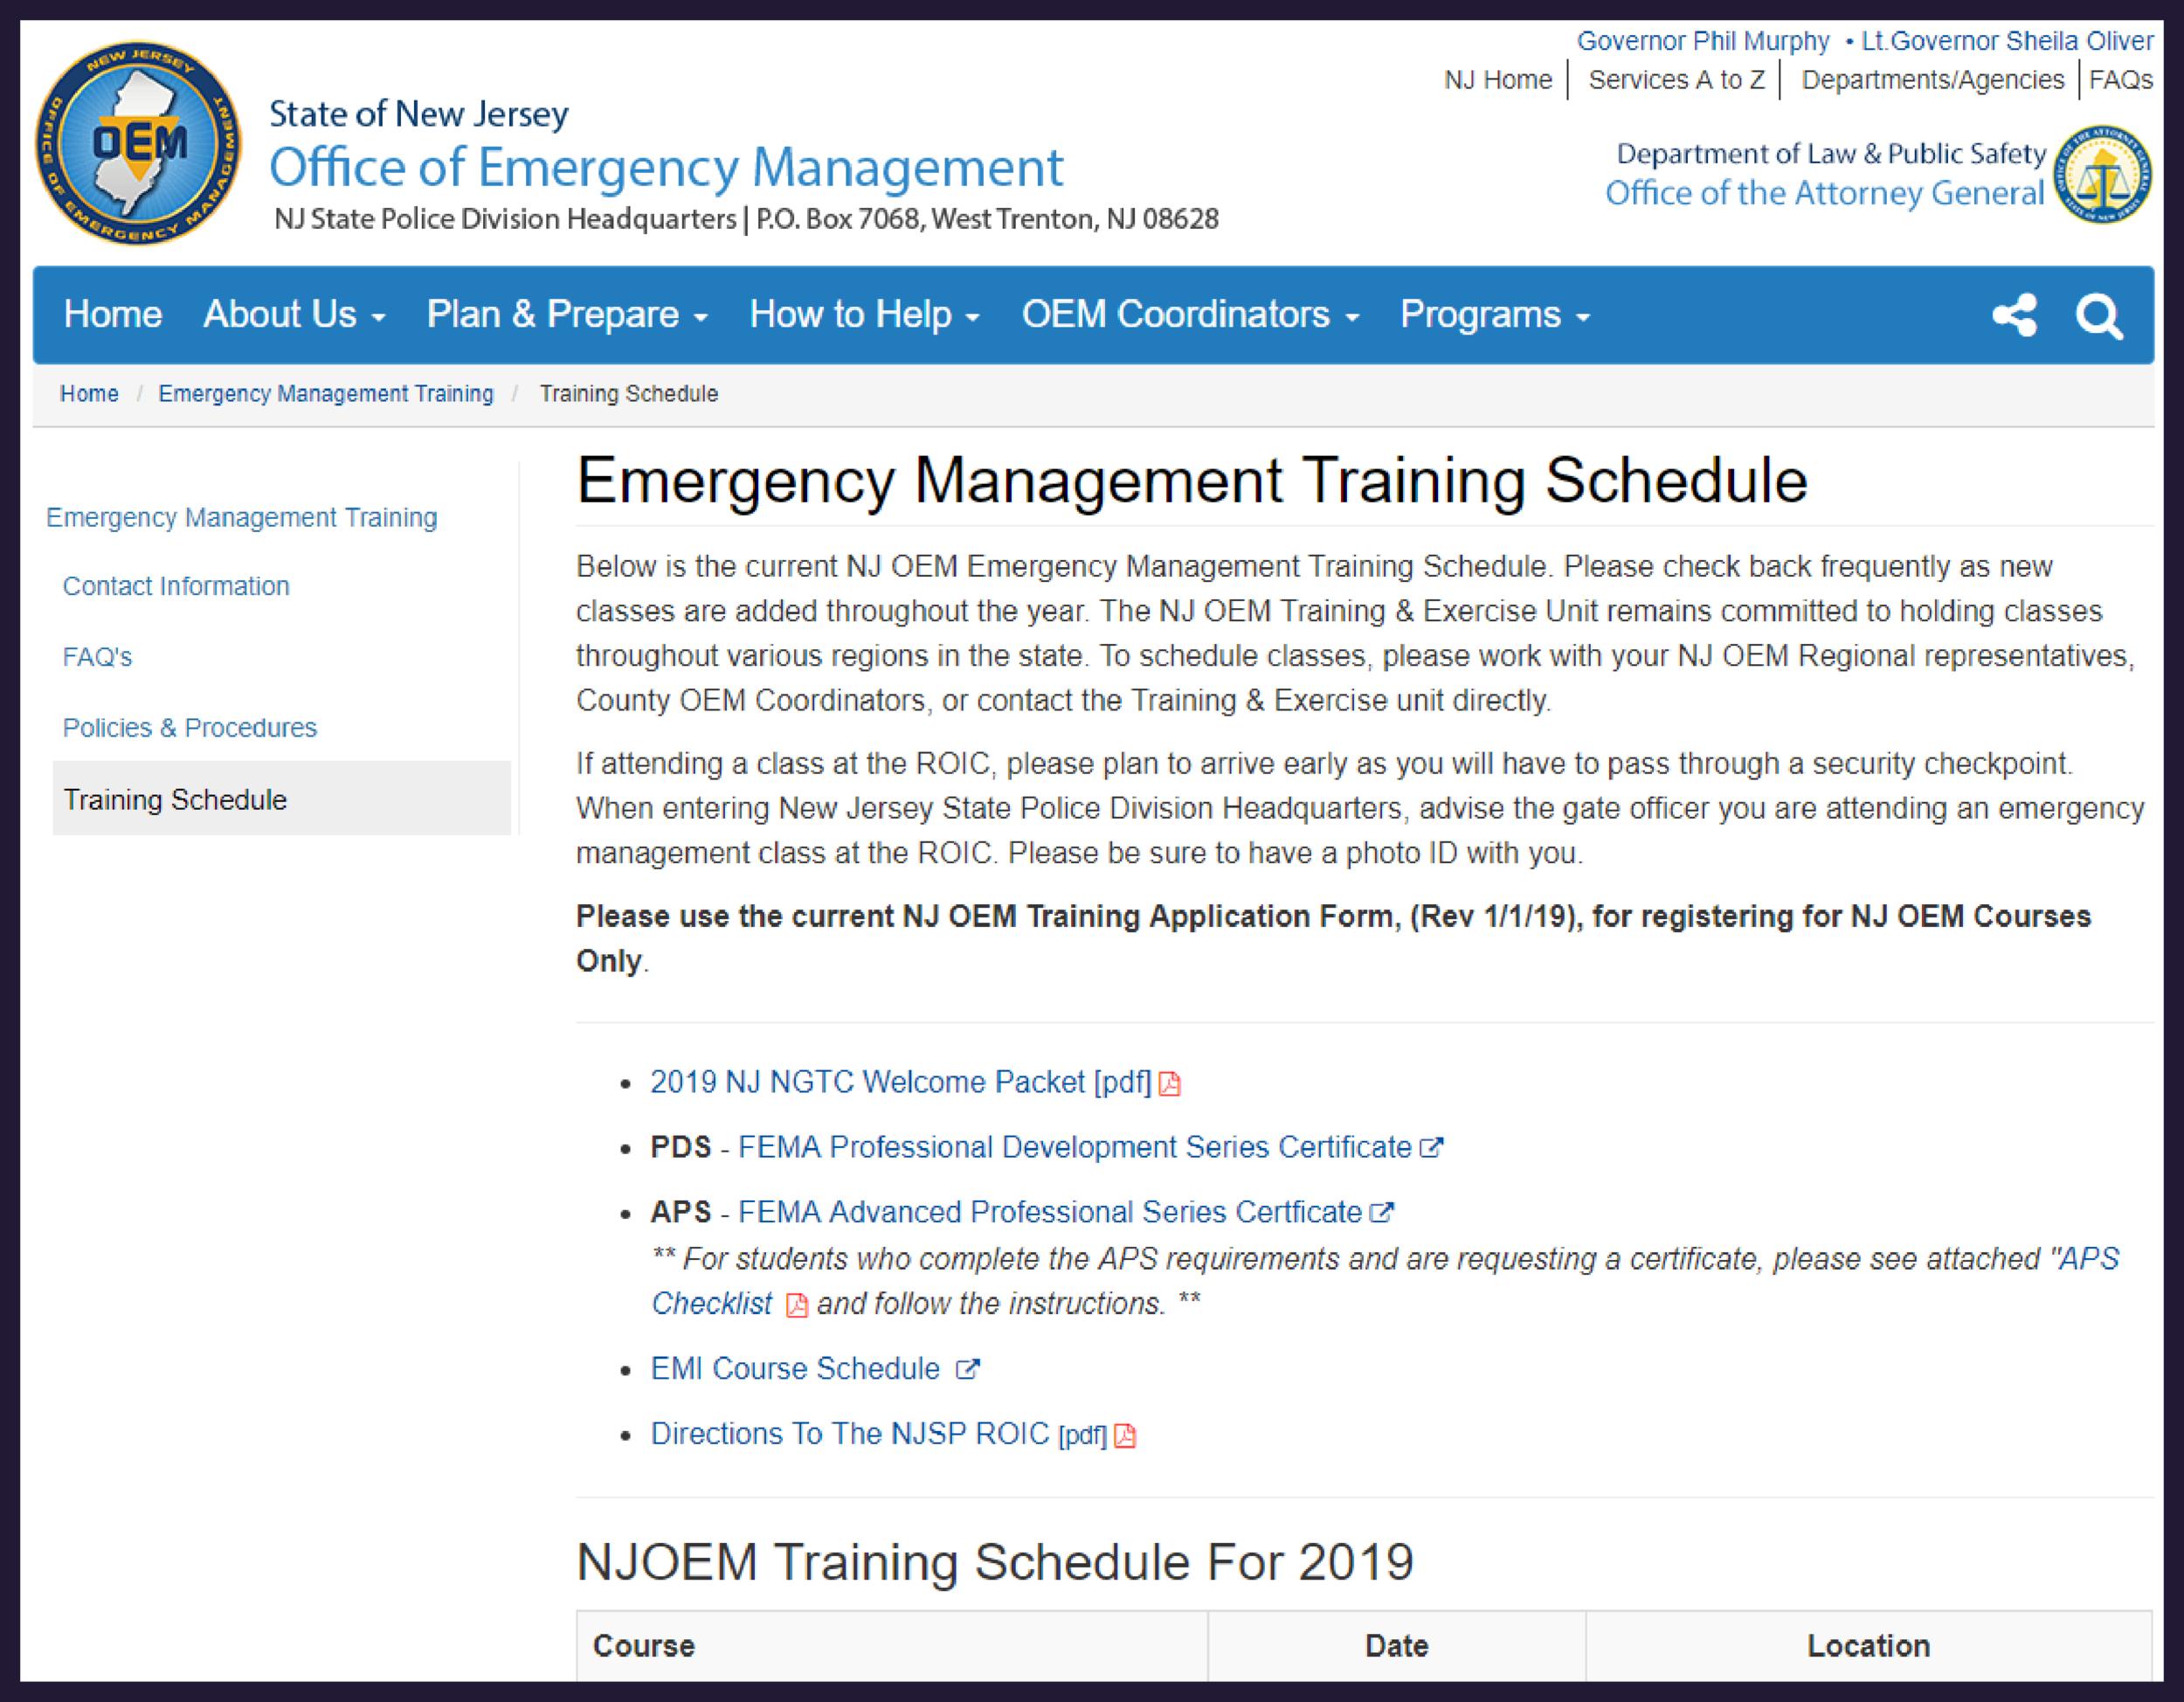 NJSP/OEM Training